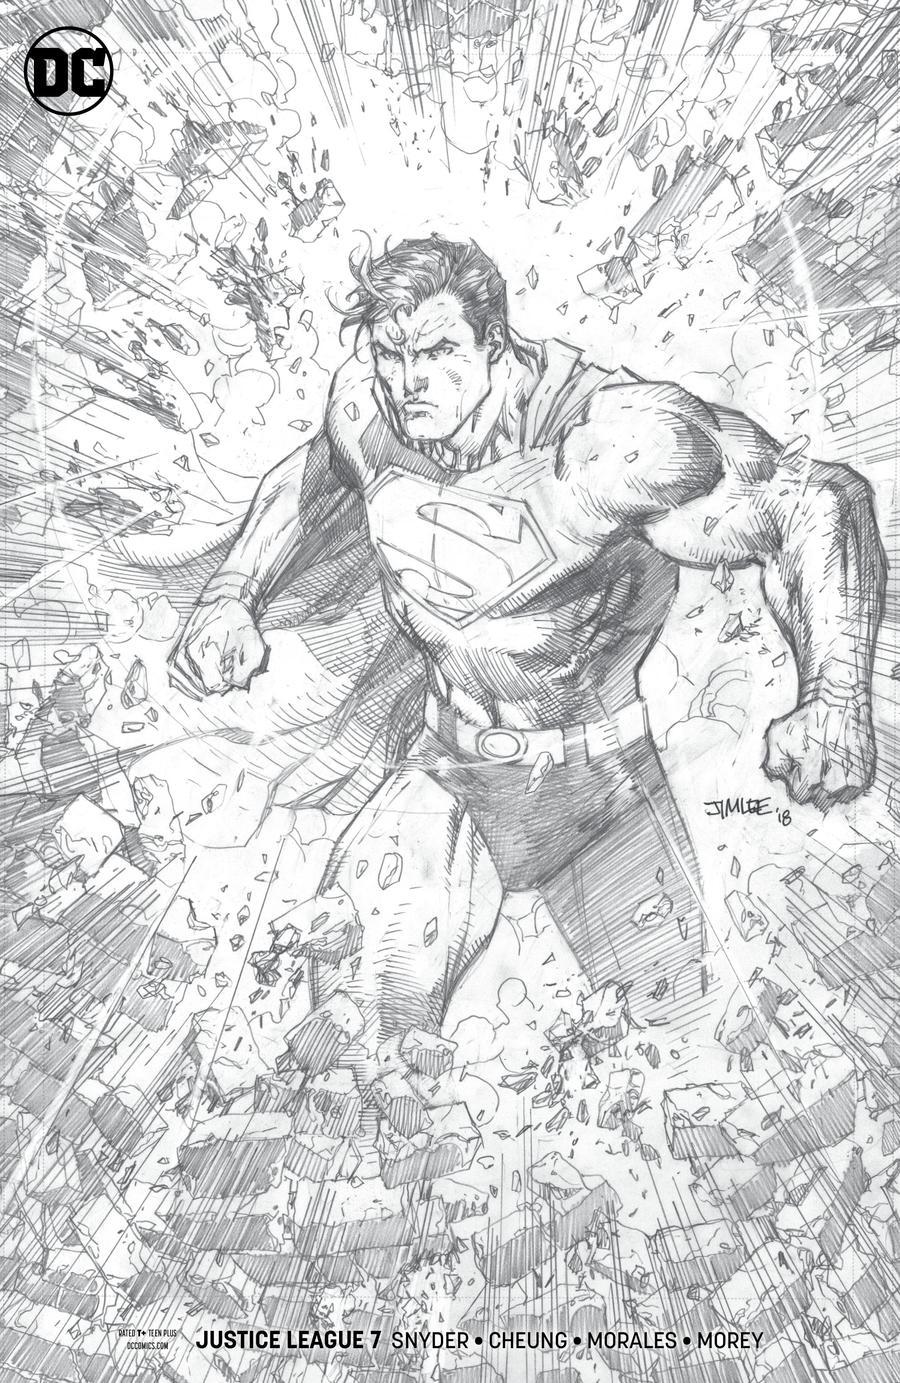 Justice League Vol 4 #7 Cover C Incentive Jim Lee Pencils Only Cover